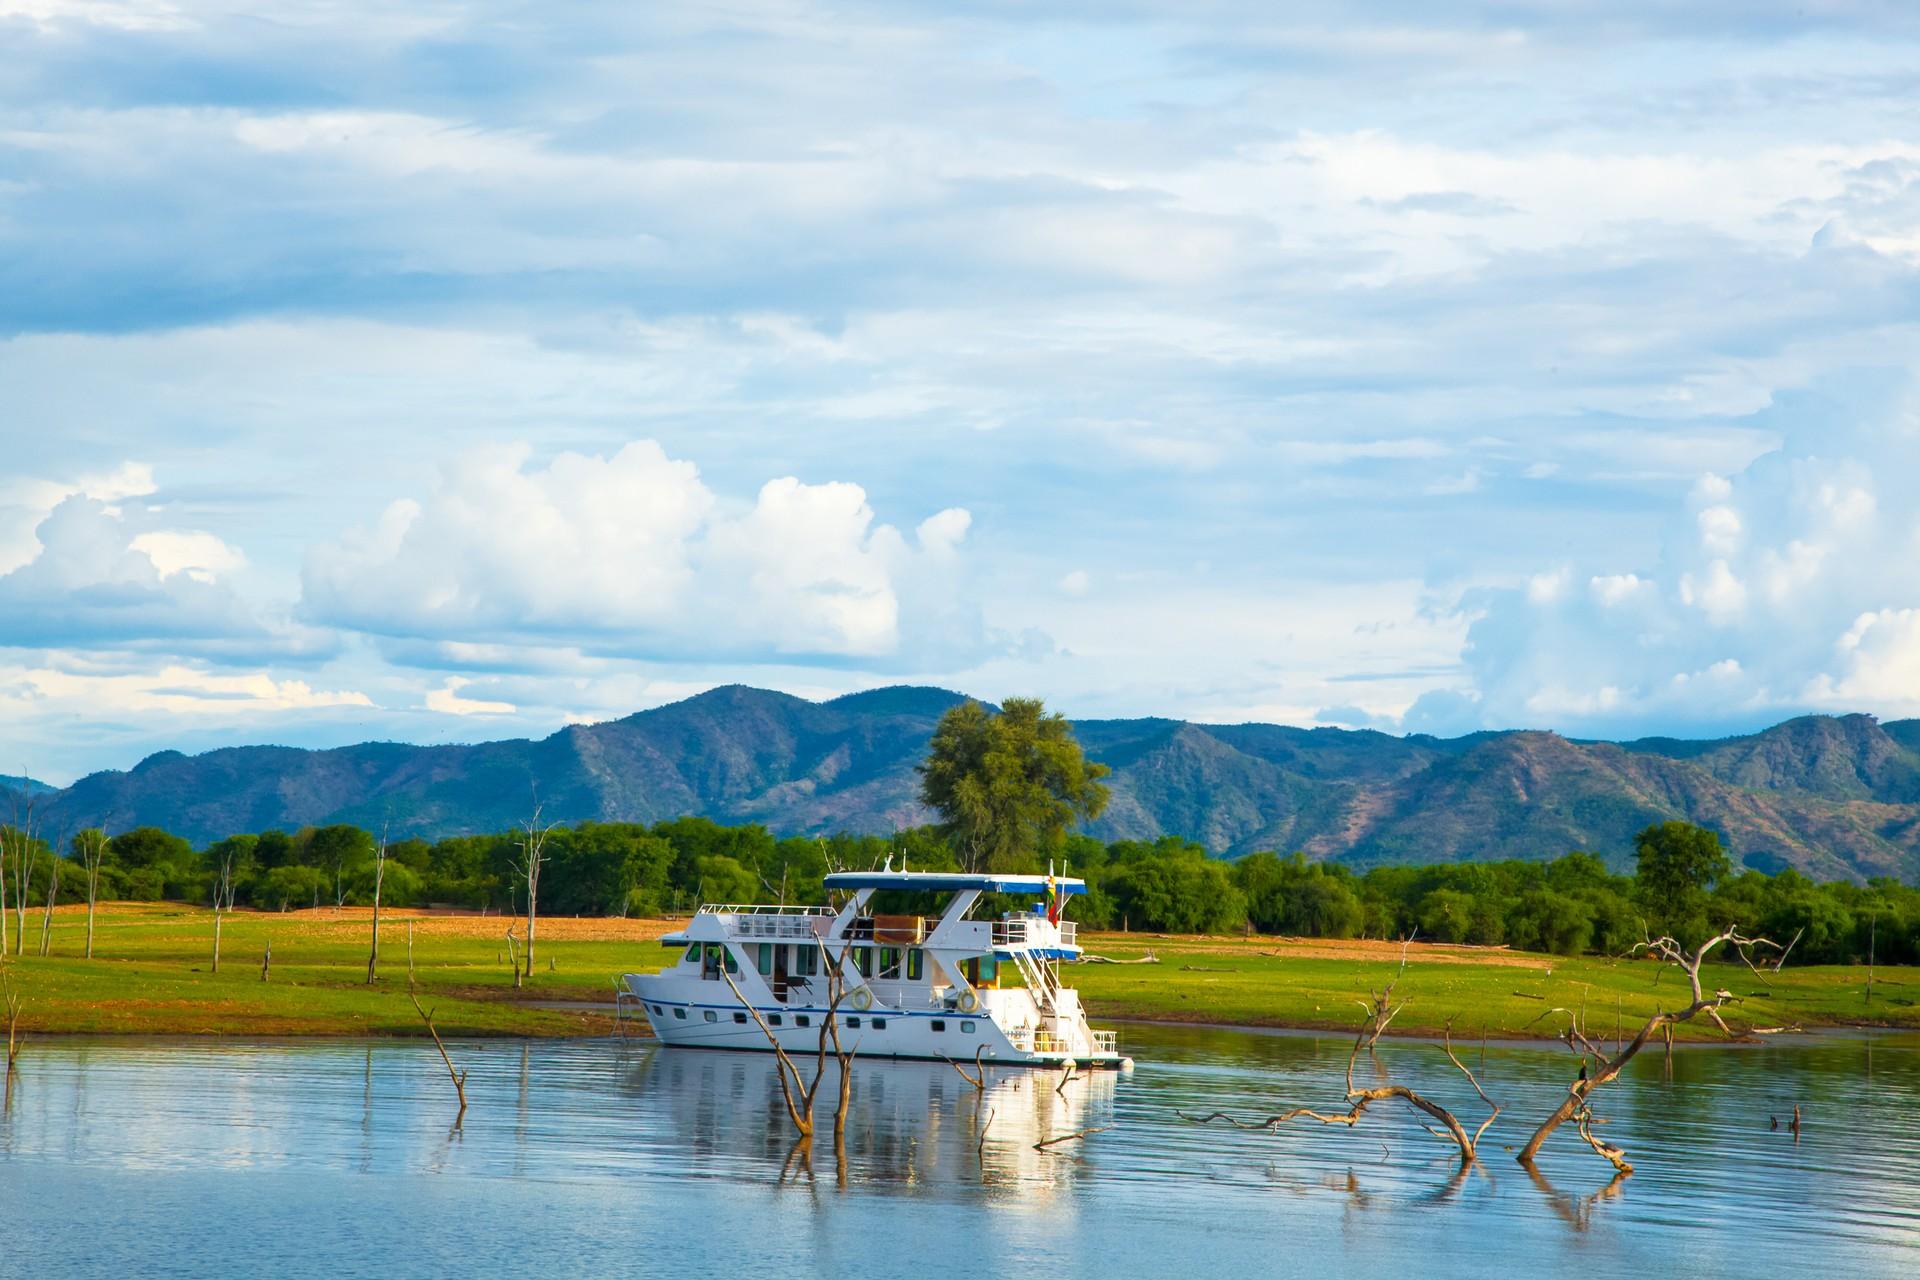 Best things to do in Zambia: Lake Kariba